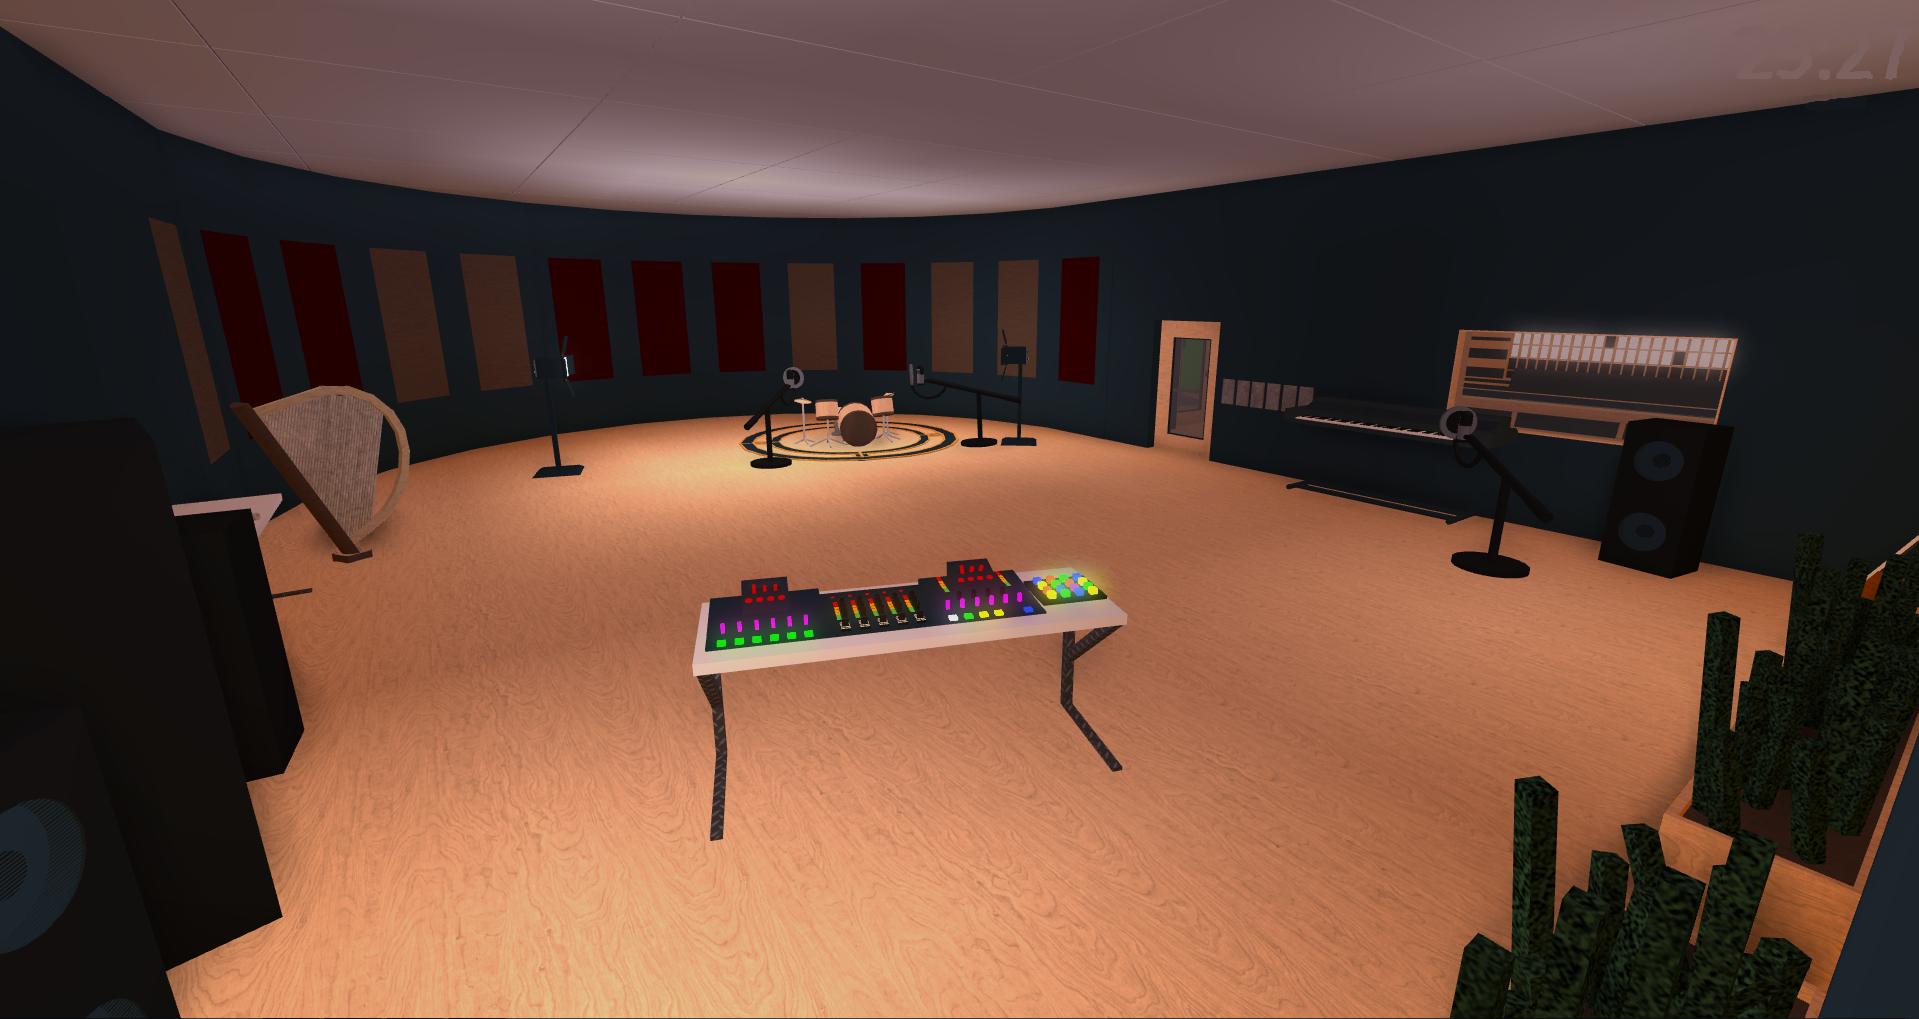 Roblox Room: Roblox Escape Room Official Wiki